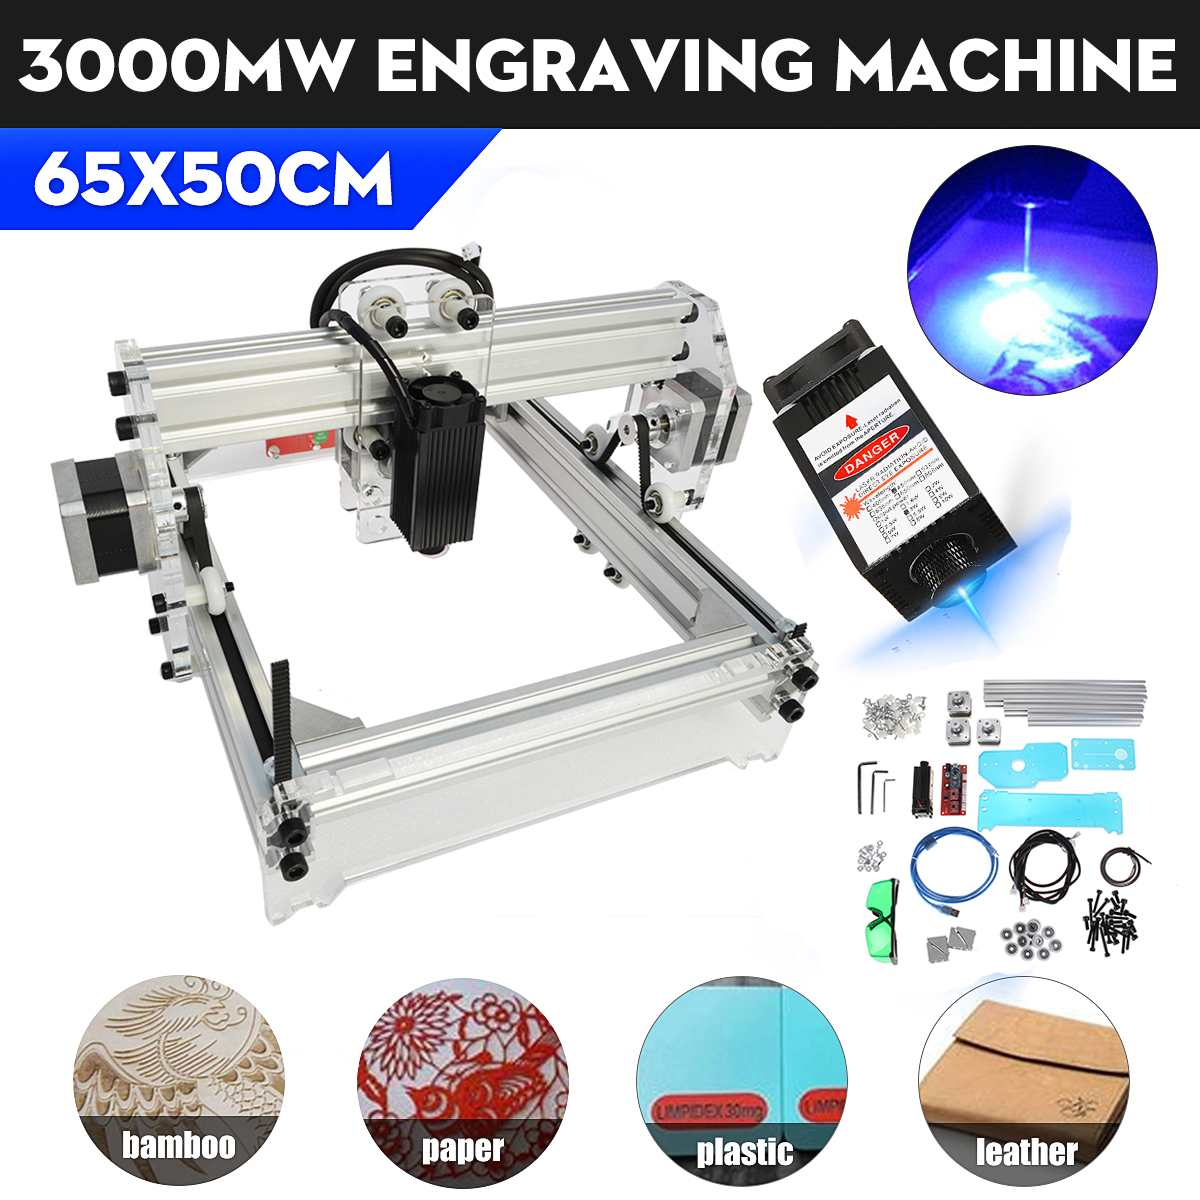 USB 3000MW 50*65cm Mini Gravur maschine DIY Stecher Maschine Desktop Holz Router/Cutter/Drucker + einstellbare Laser AC110-220V